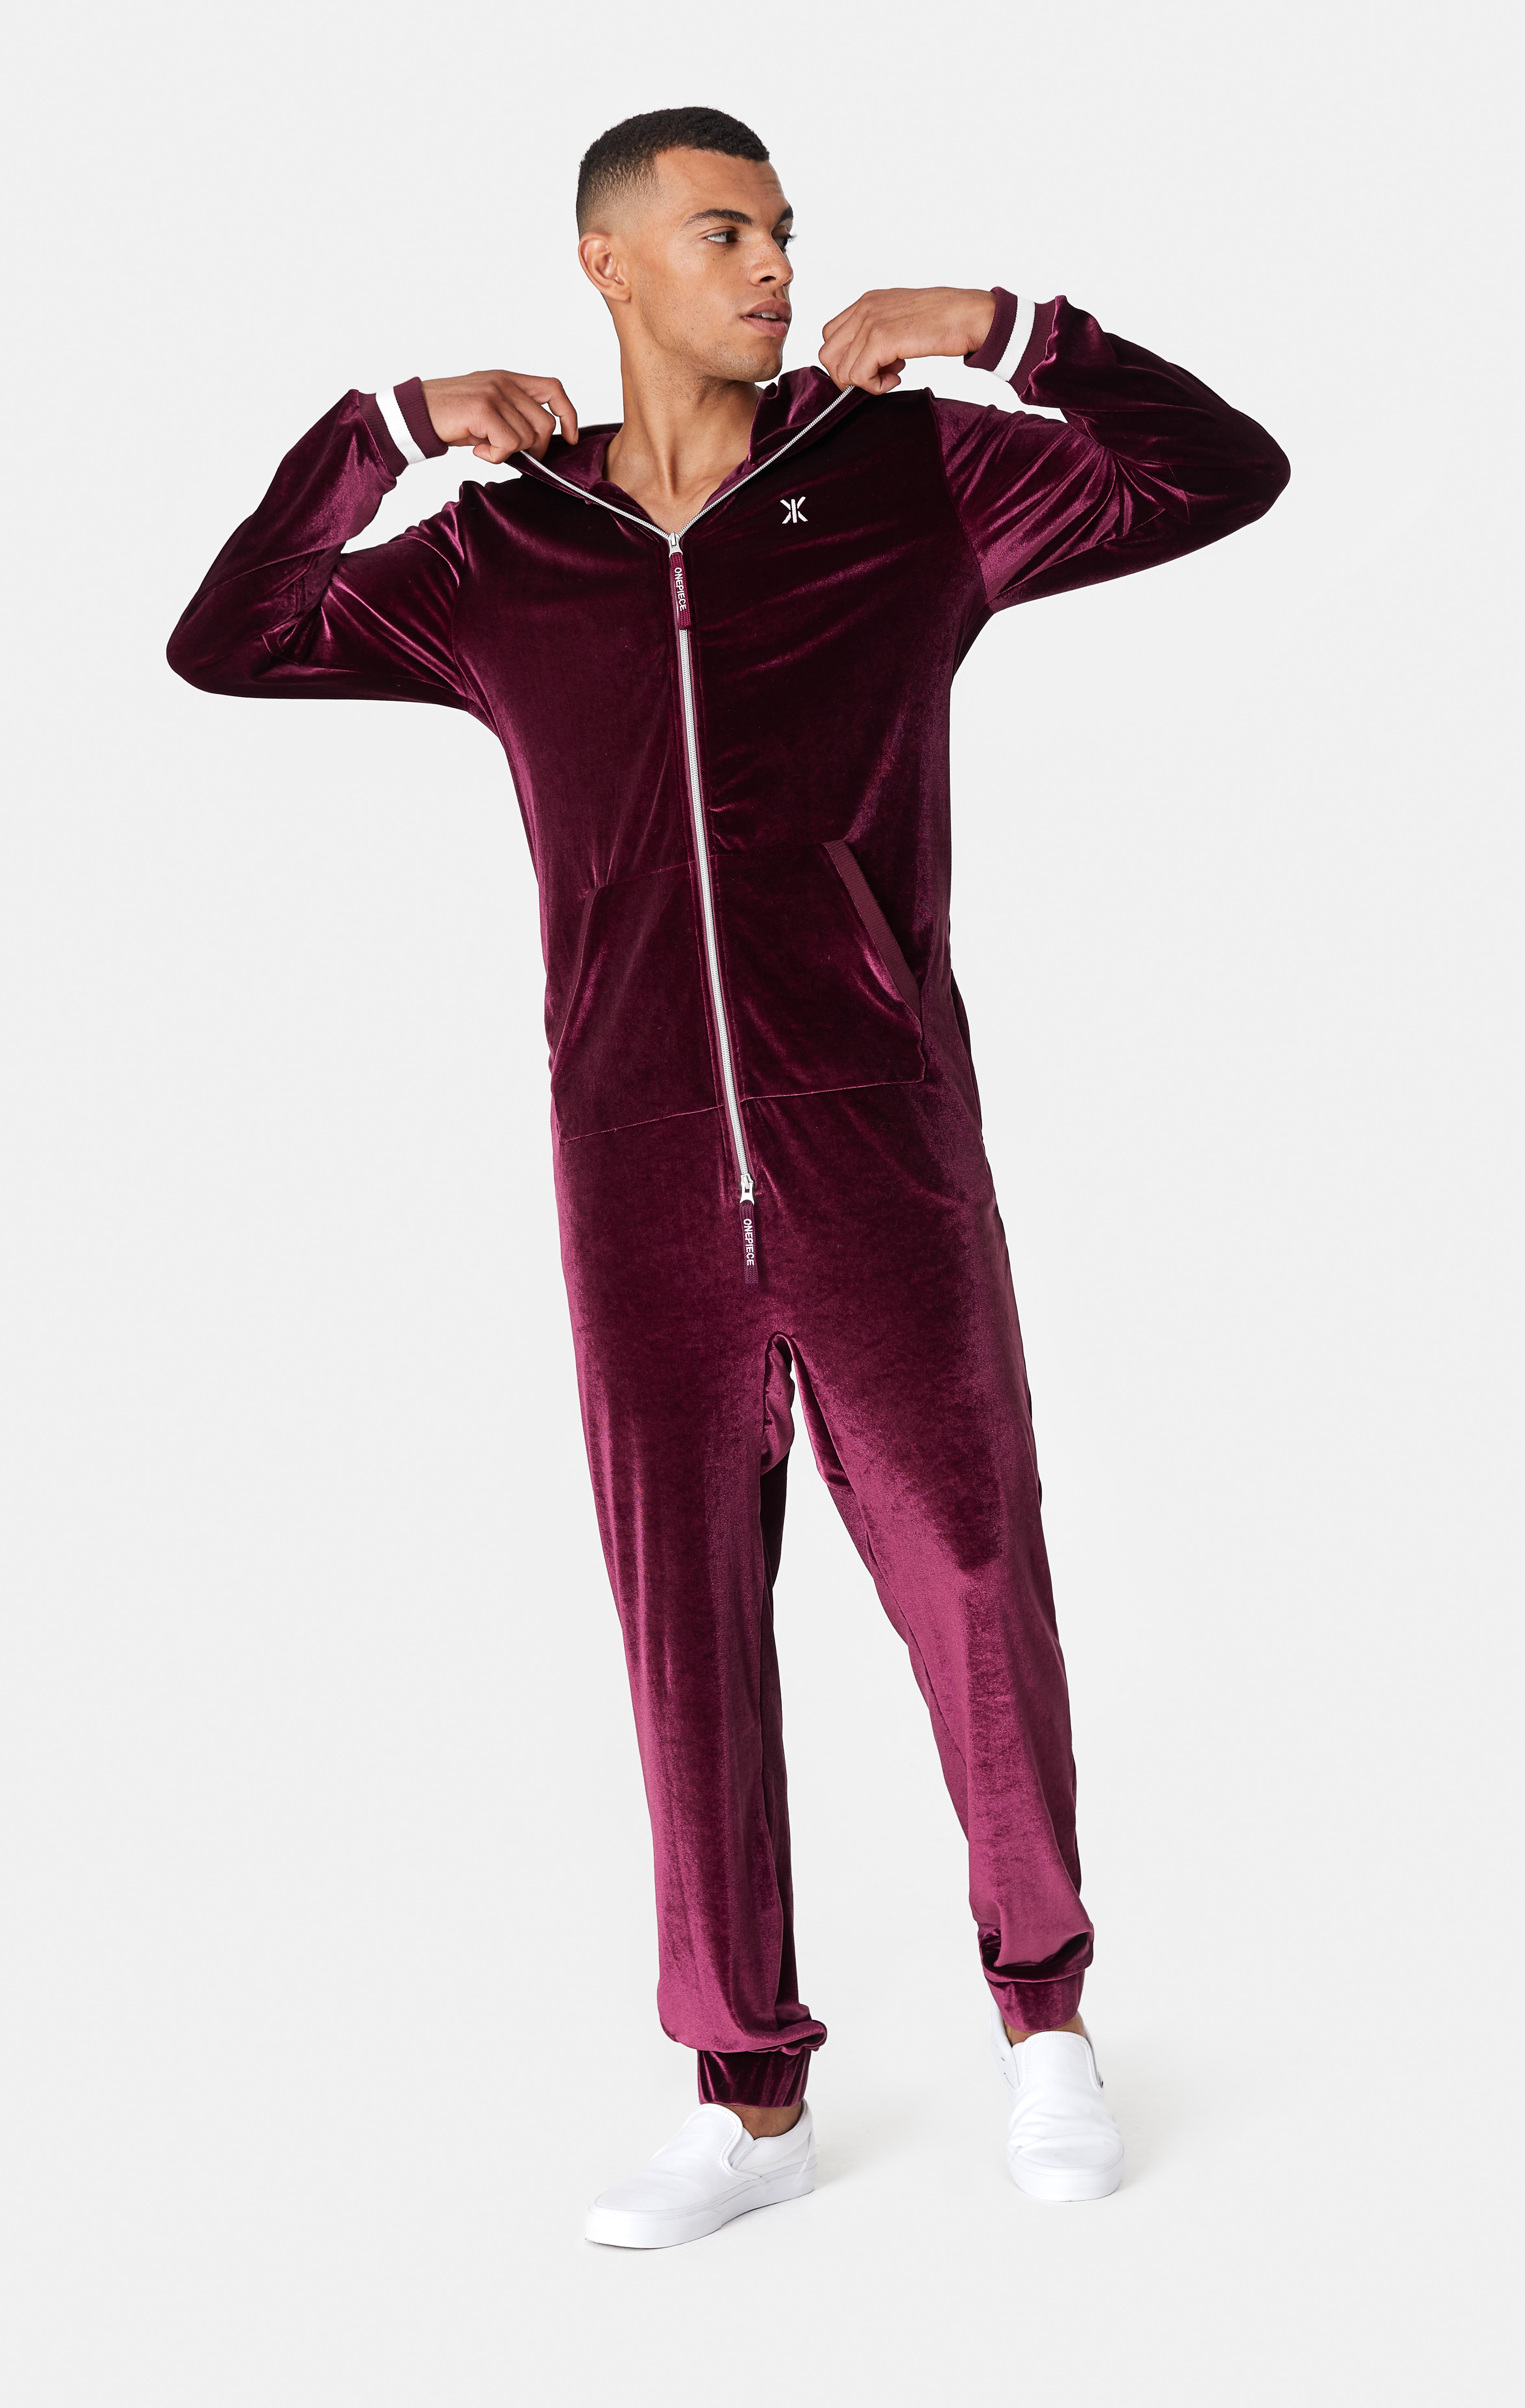 10 Best Velour Hoodie Jumpsuit images | Jumpsuit, Hoodies